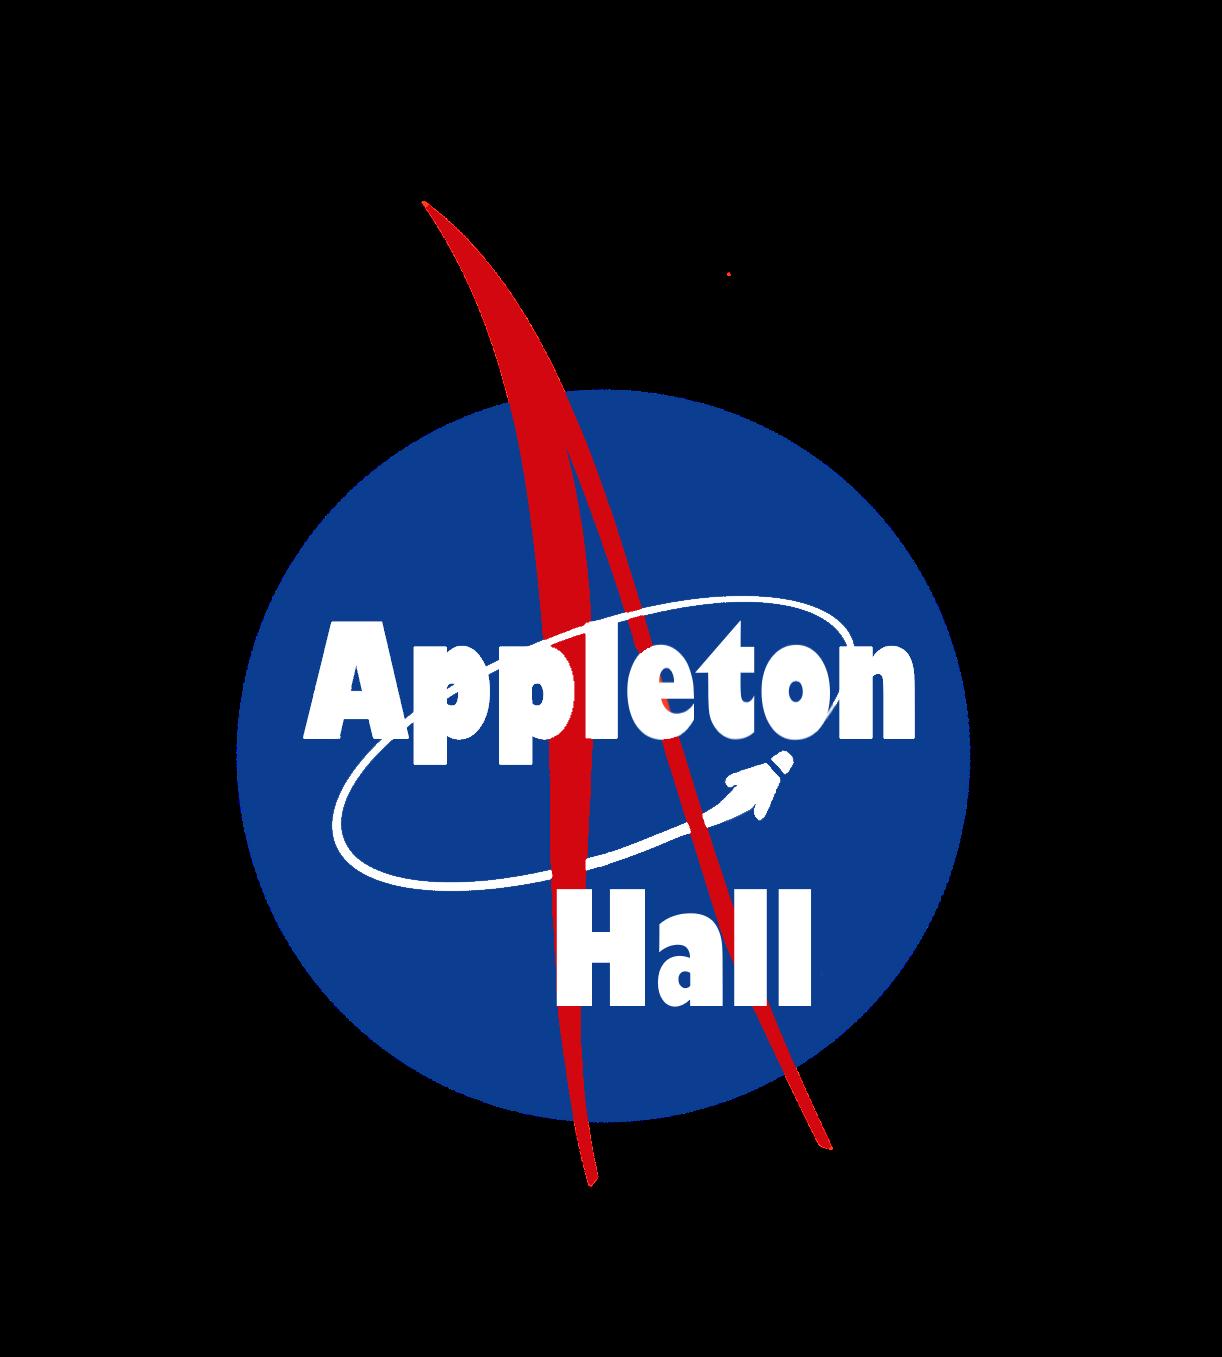 Appleton-hall-badminton-club